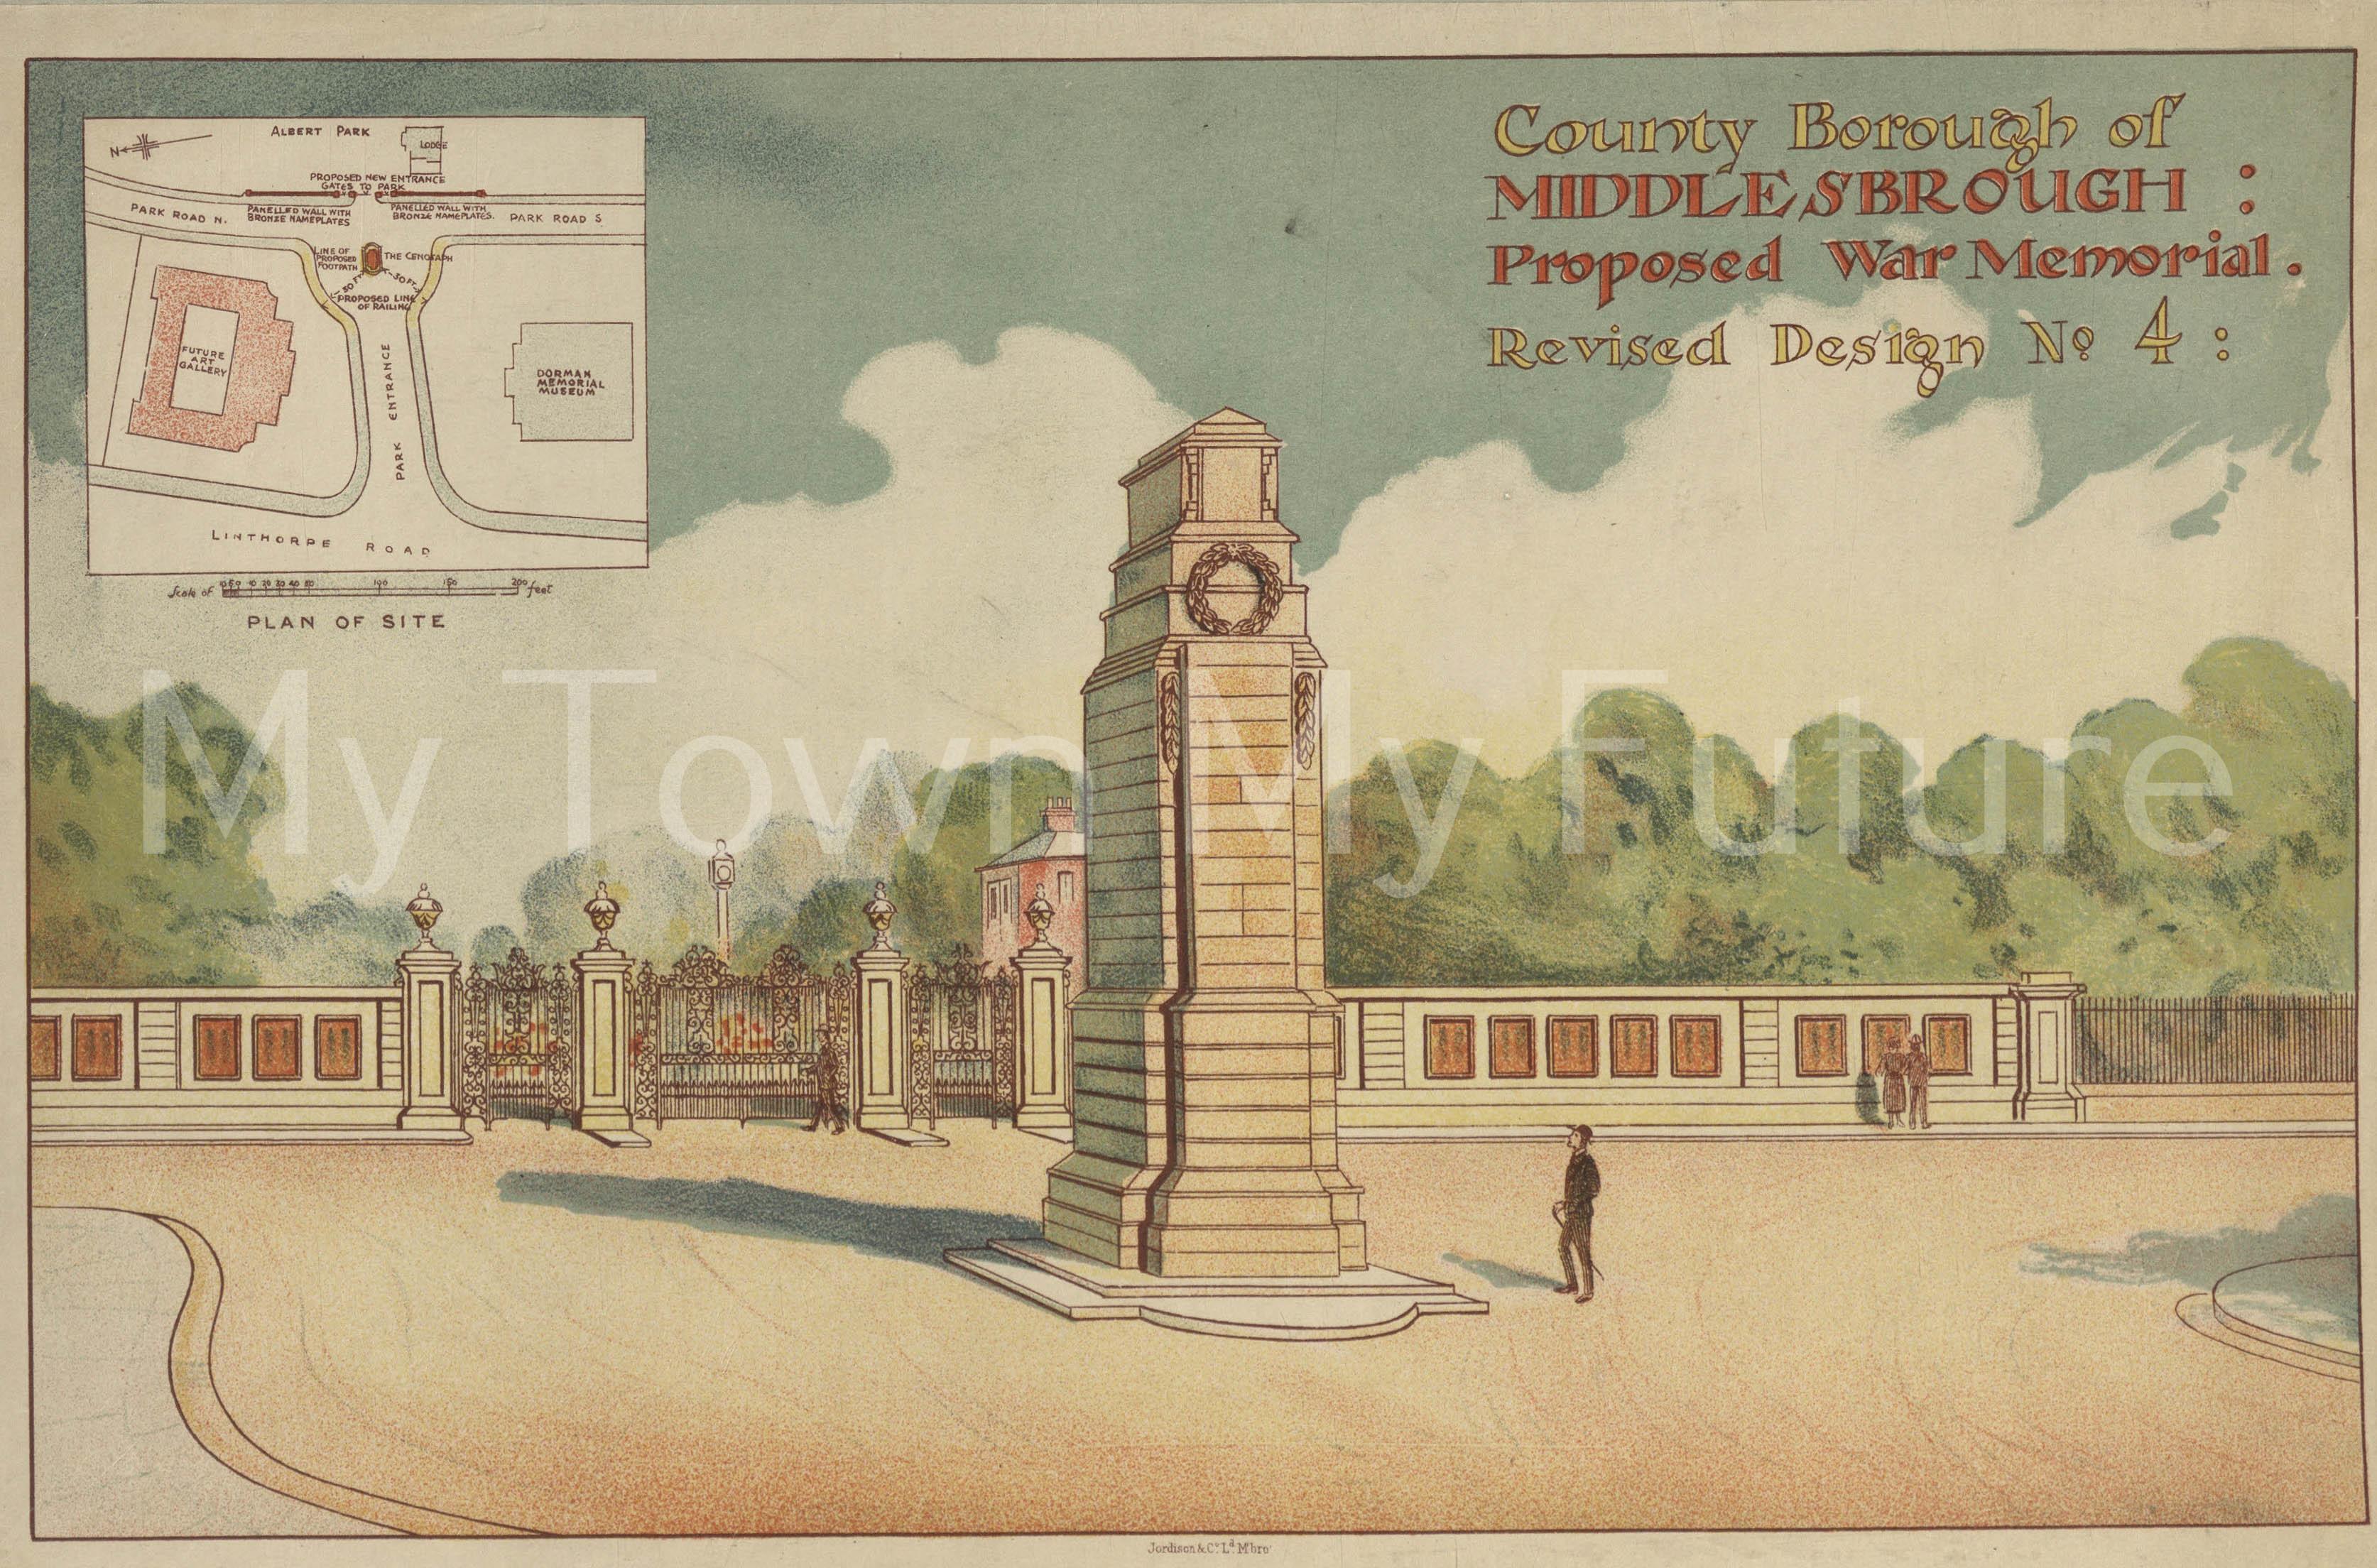 Middlesbrough Cenotaph - Middlesbrough Public Libraries